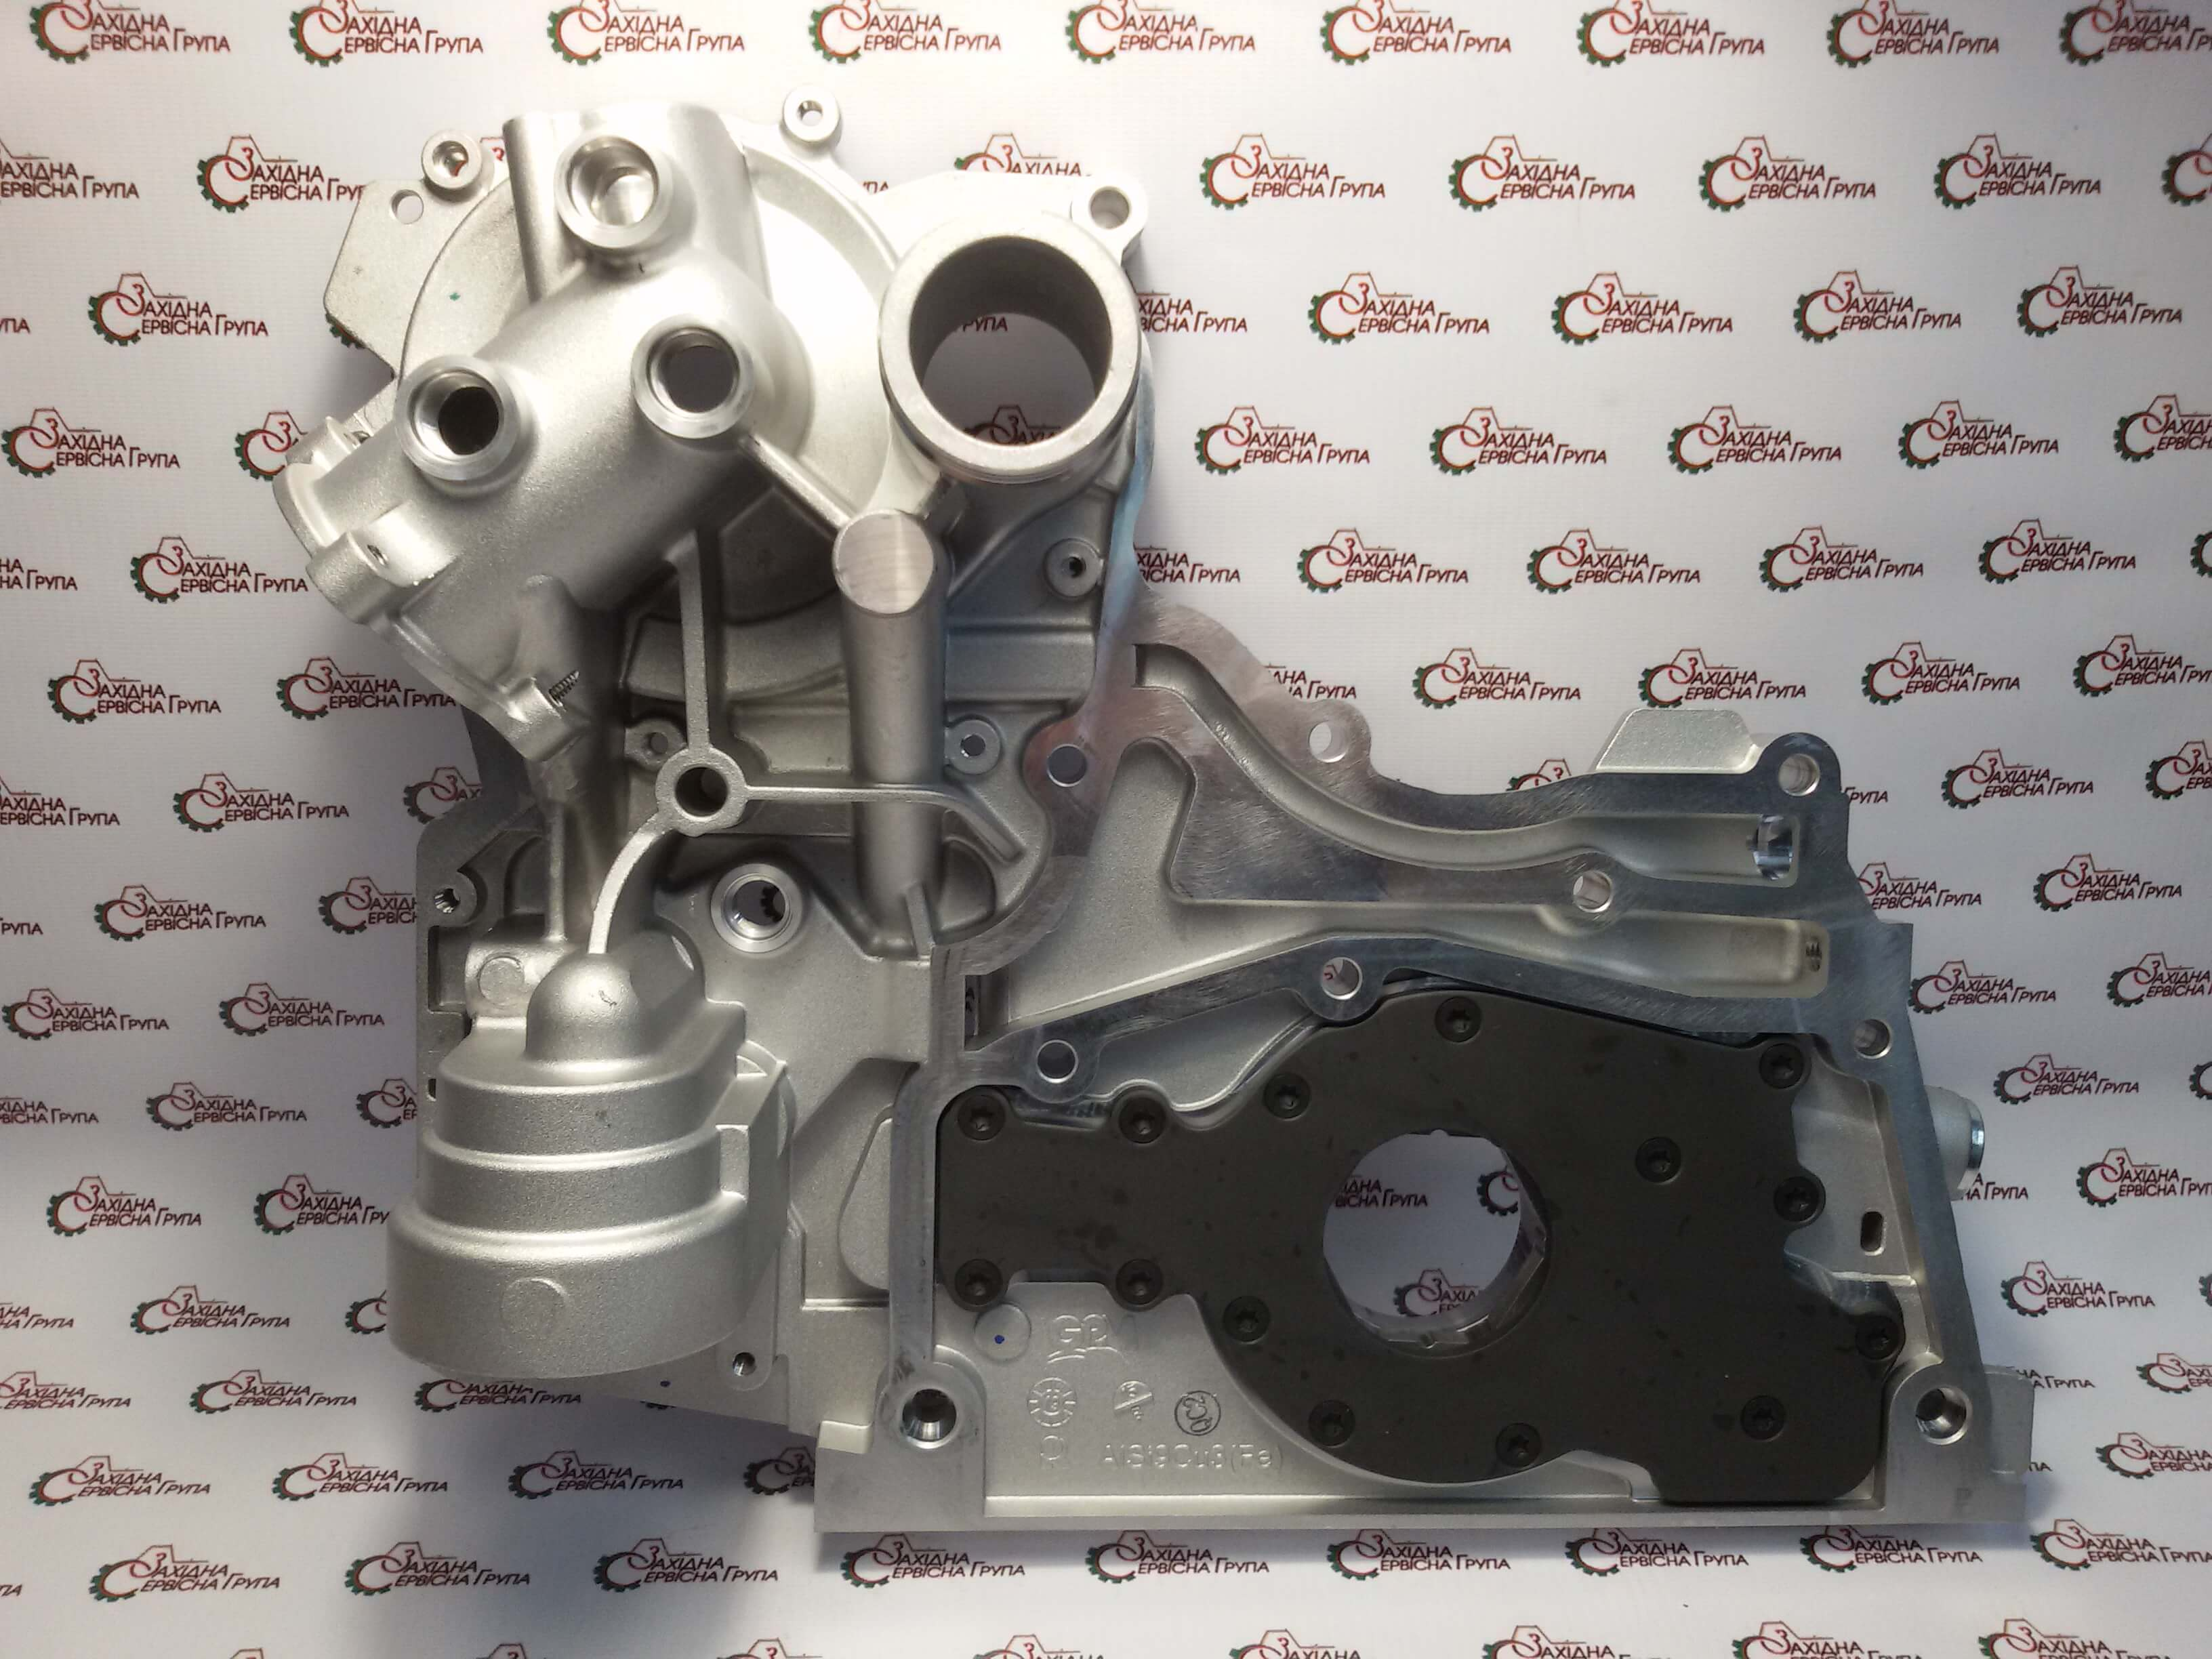 Кришка двигуна передня / насос масляний Cummins ISF 2.8, 5475199, 5302888, 5302887, 5274914, 5269789.